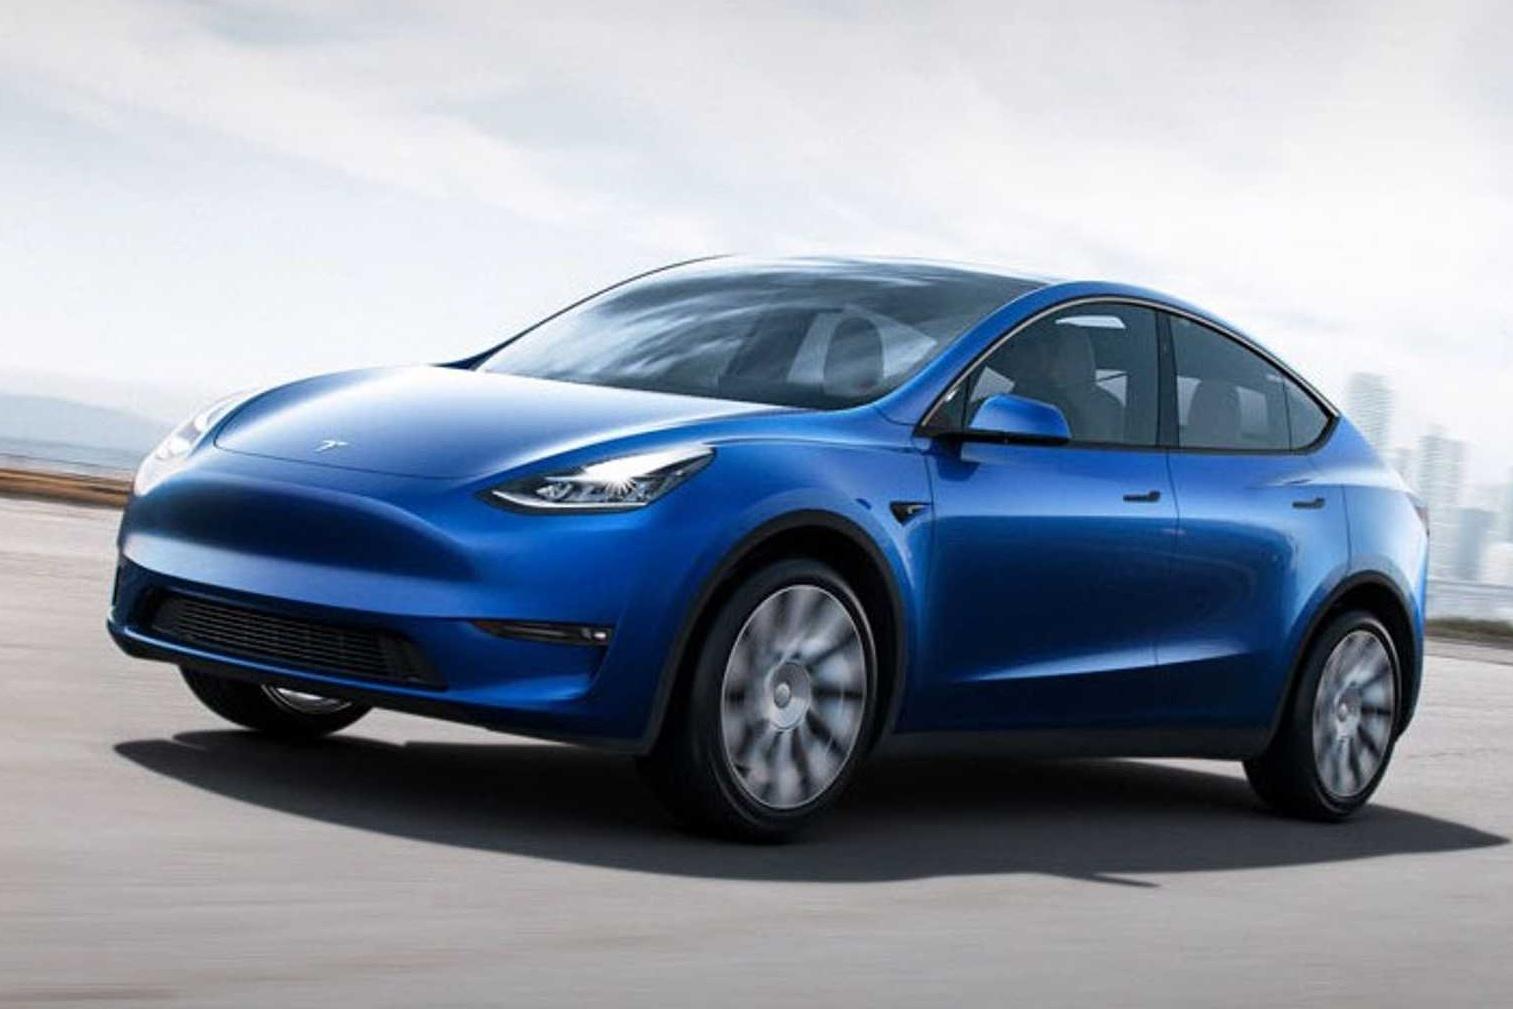 Tesla Model Y ครอสส์โอเวอร์พลังงานไฟฟ้า ขนาดกะทัดรัด หลากหลายพละกำลังตามแต่รุ่นย่อย  autoinfo.co.th